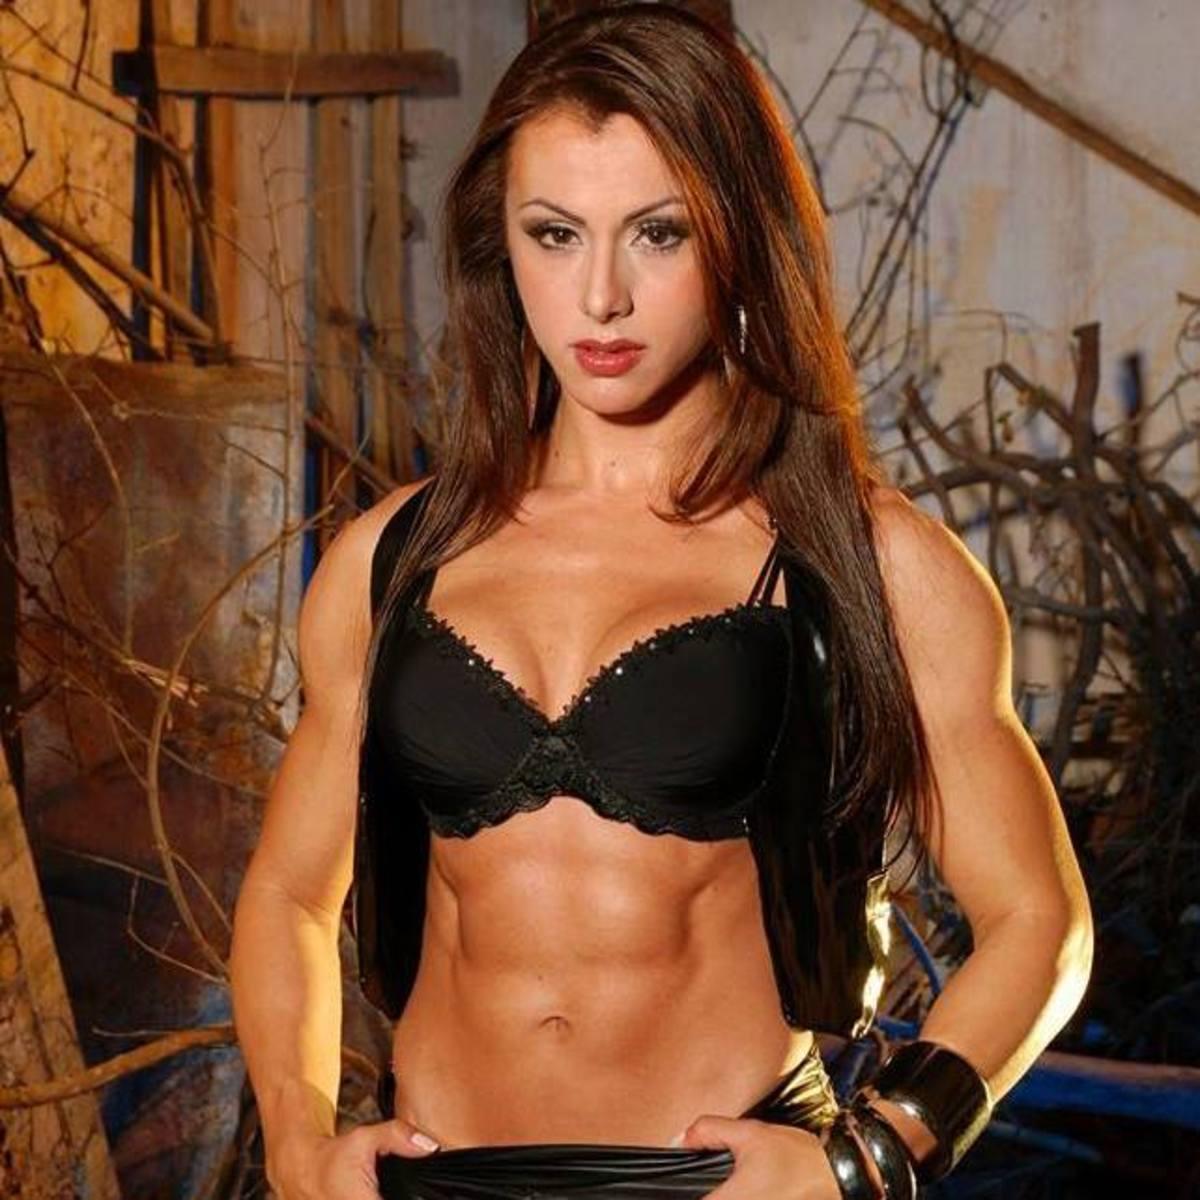 Brazilian female bodybuilder and fitness model Marjorine Cardoso